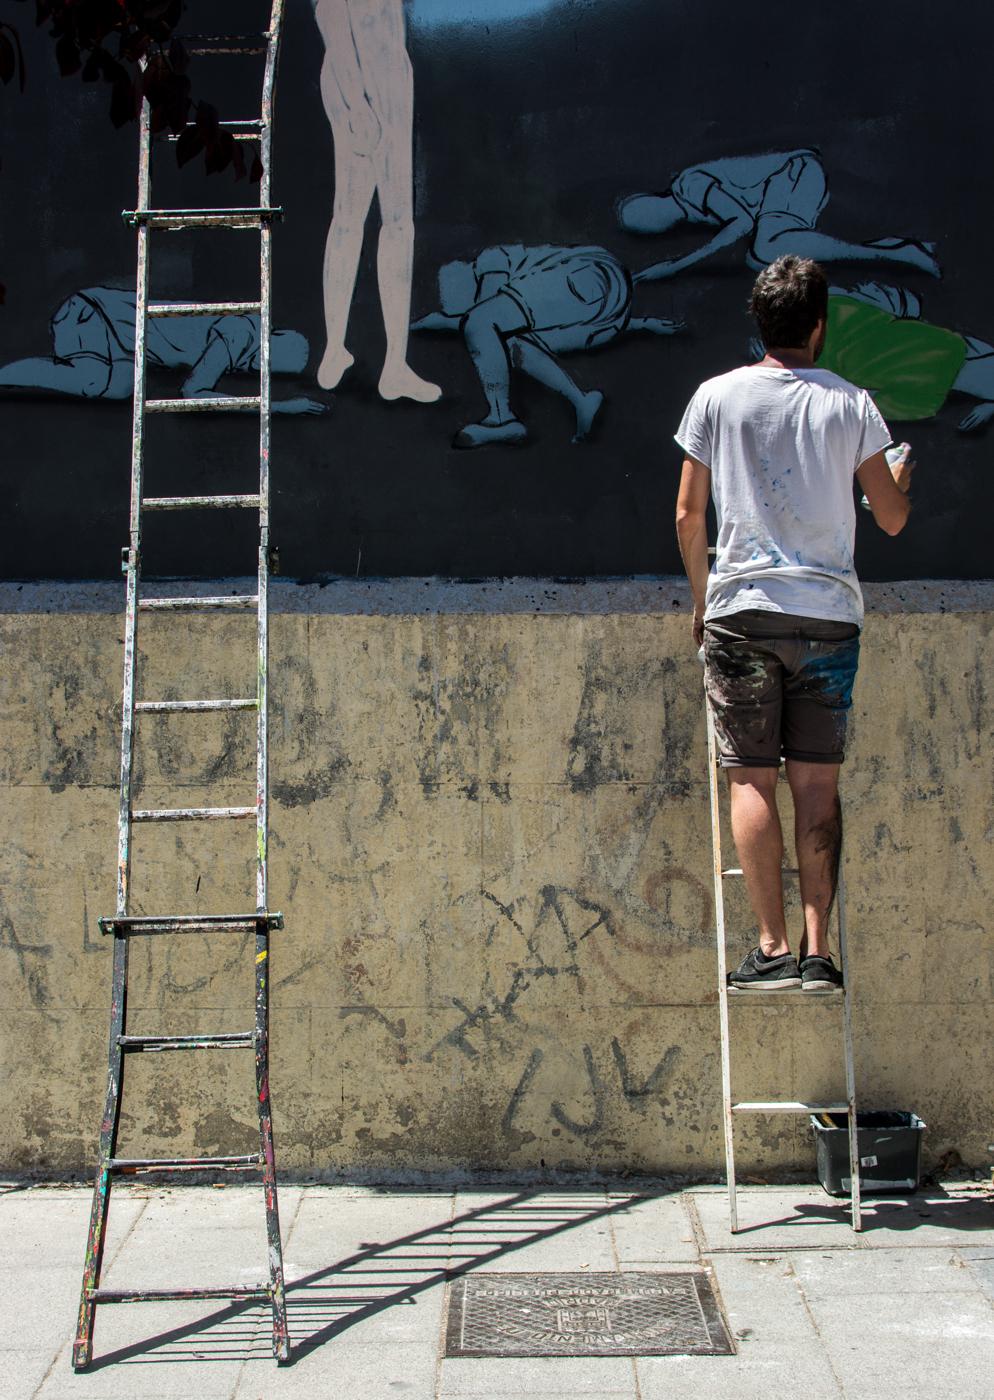 Dadi Dreucol proceso - MurosTabacalera by Guillermo de la Madrid - Madrid Street Art Project -06-2.jpg